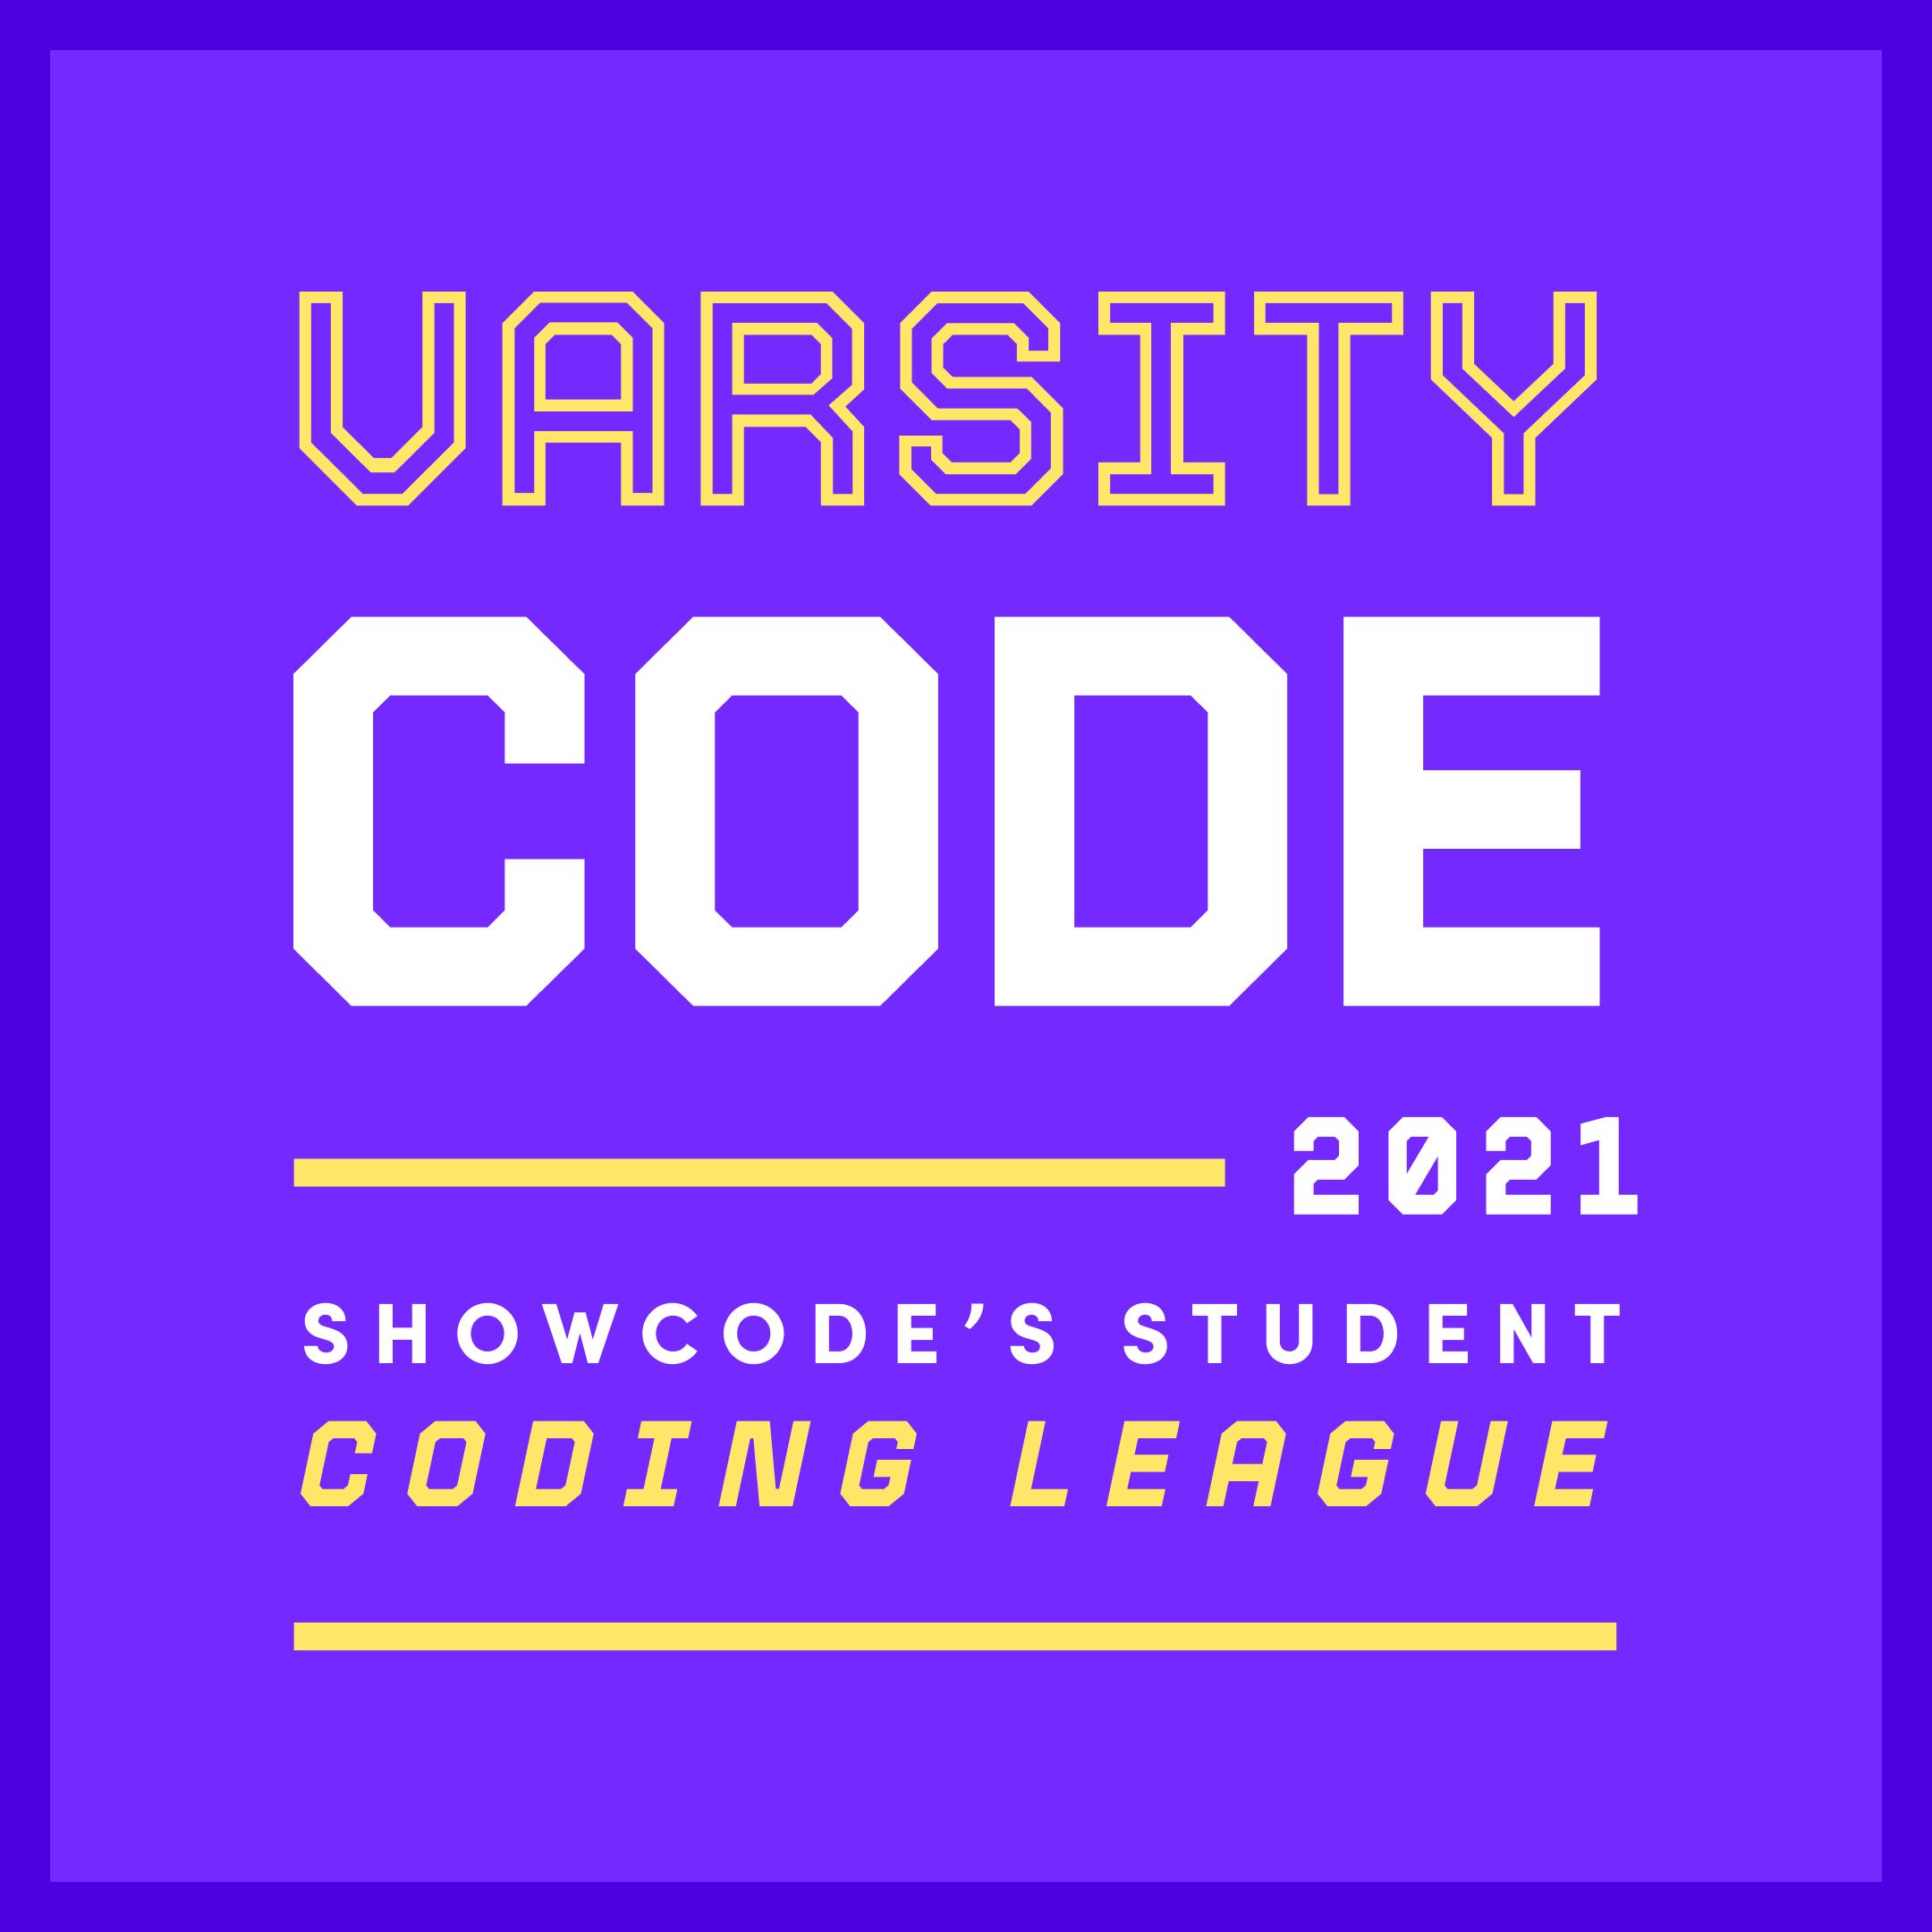 Varsity code 2021